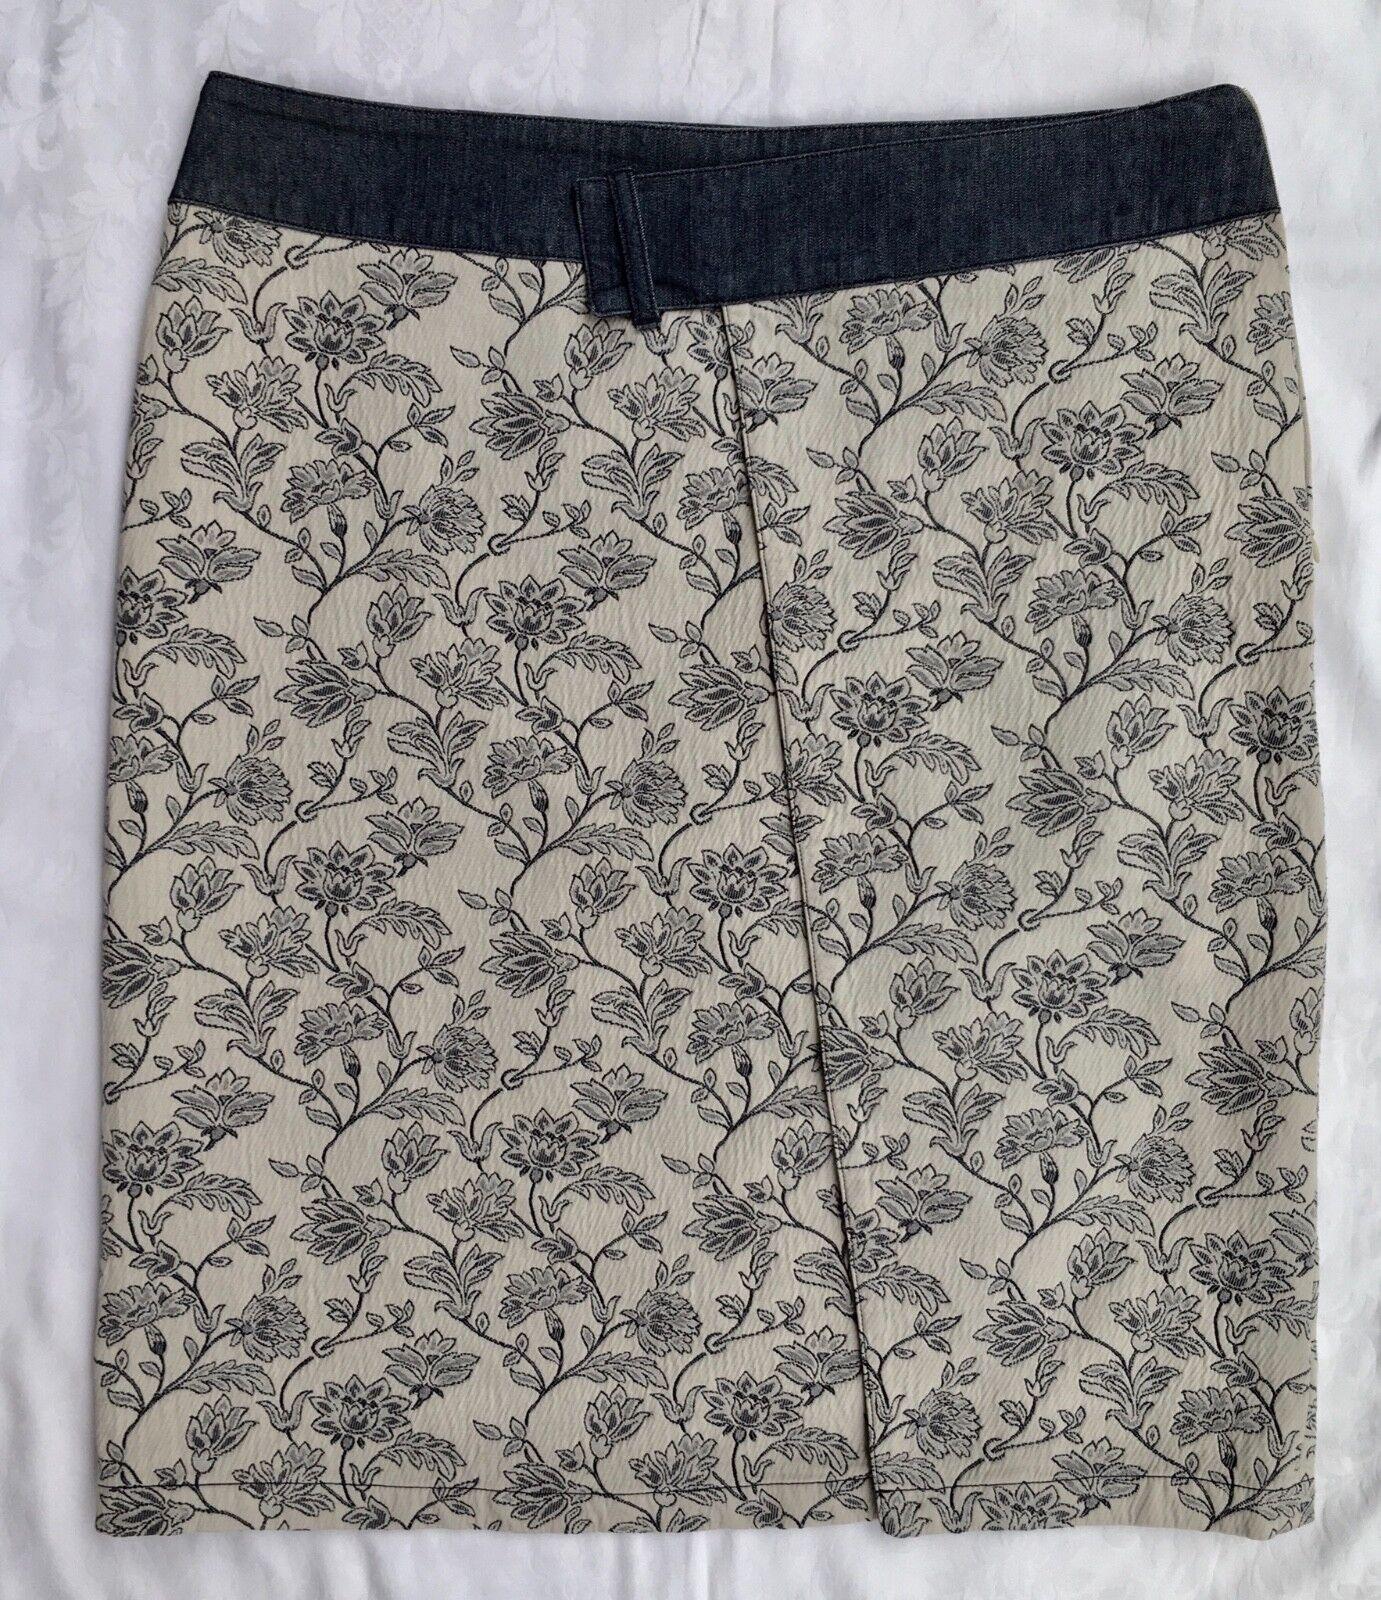 Authentic Armani, MINT Pencil skirt, Knee length,100% cotton, G.B.16, ,